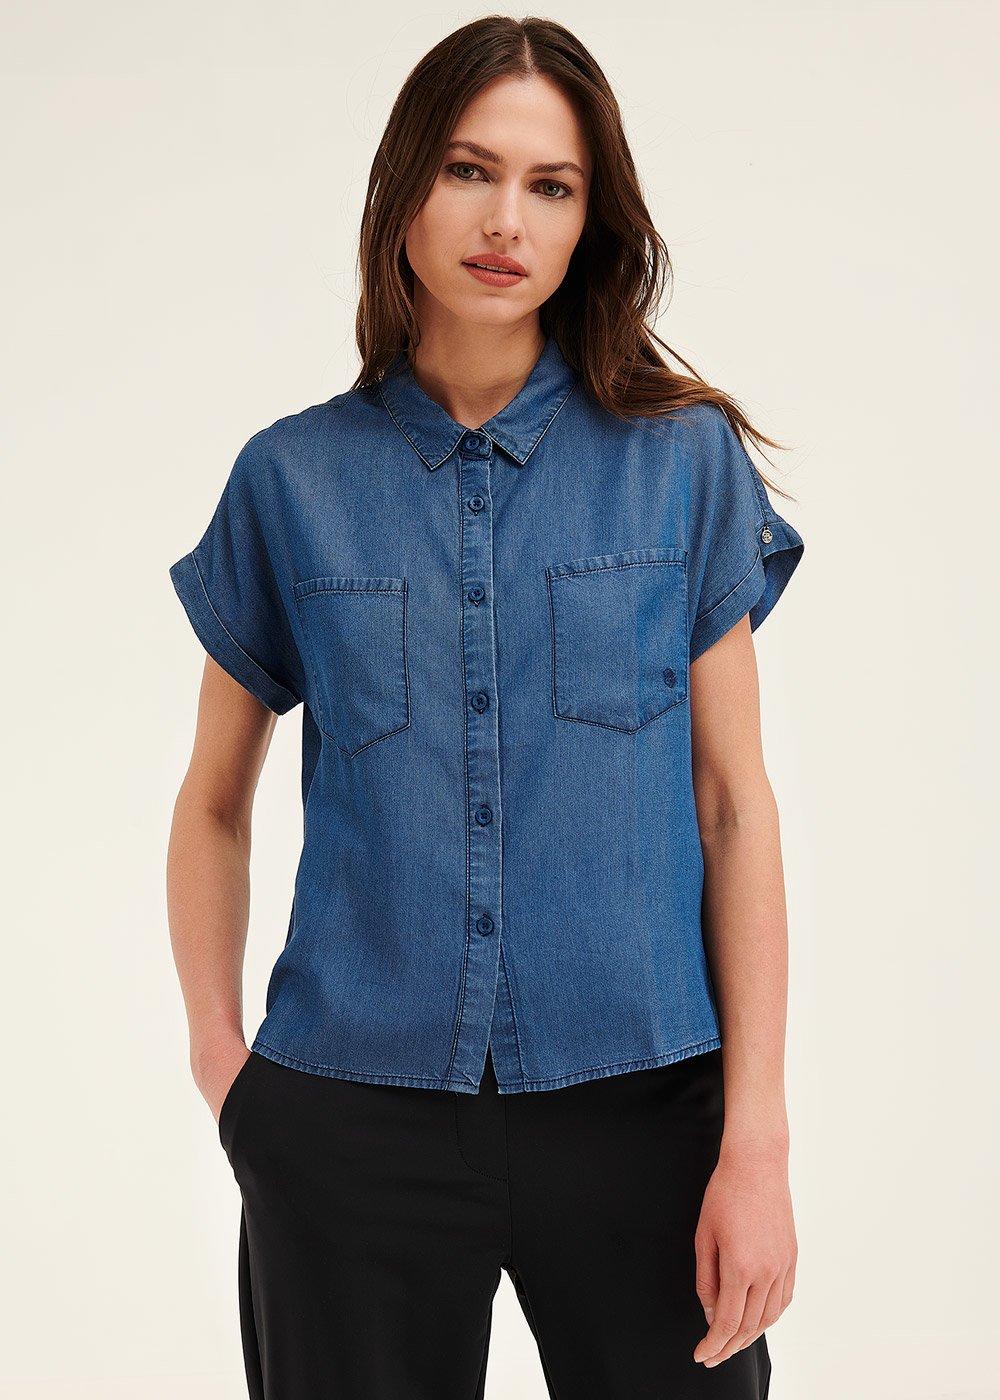 Carol short-sleeved denim shirt - Light Blue - Woman